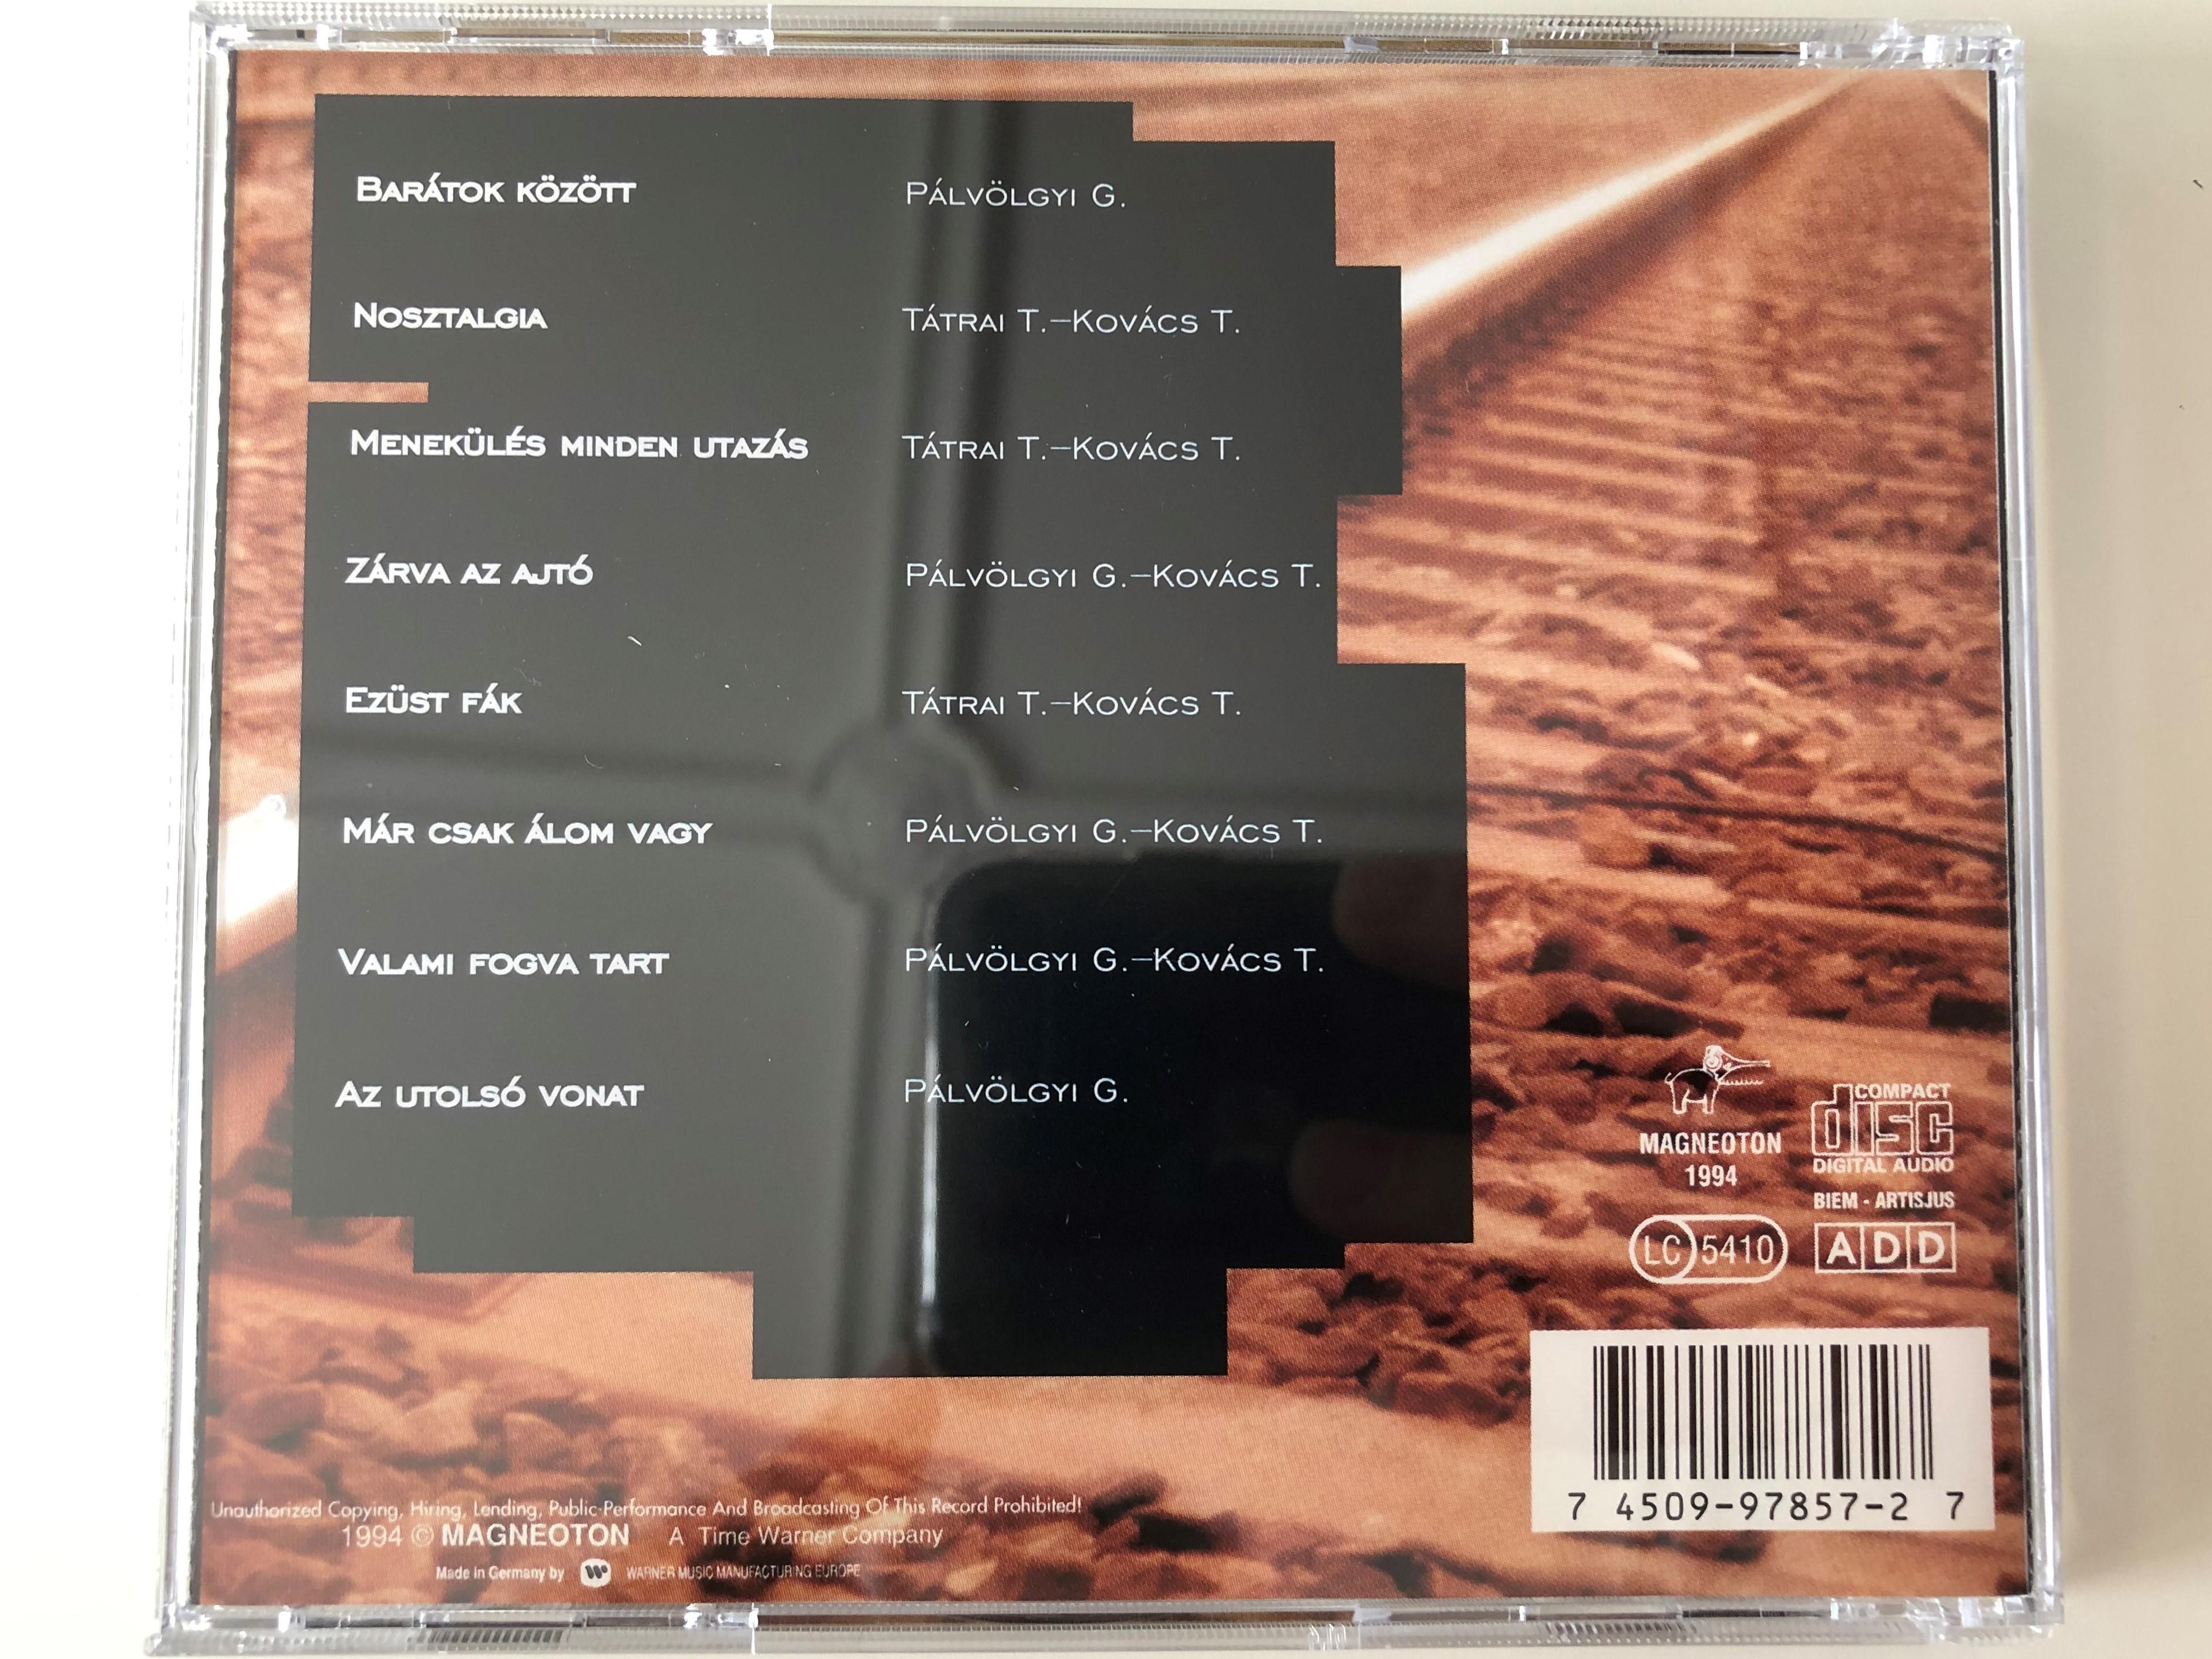 t-trai-band-utaz-s-az-ismeretlenbe...-ii.-magneoton-audio-cd-1994-4509-978572-5-.jpg